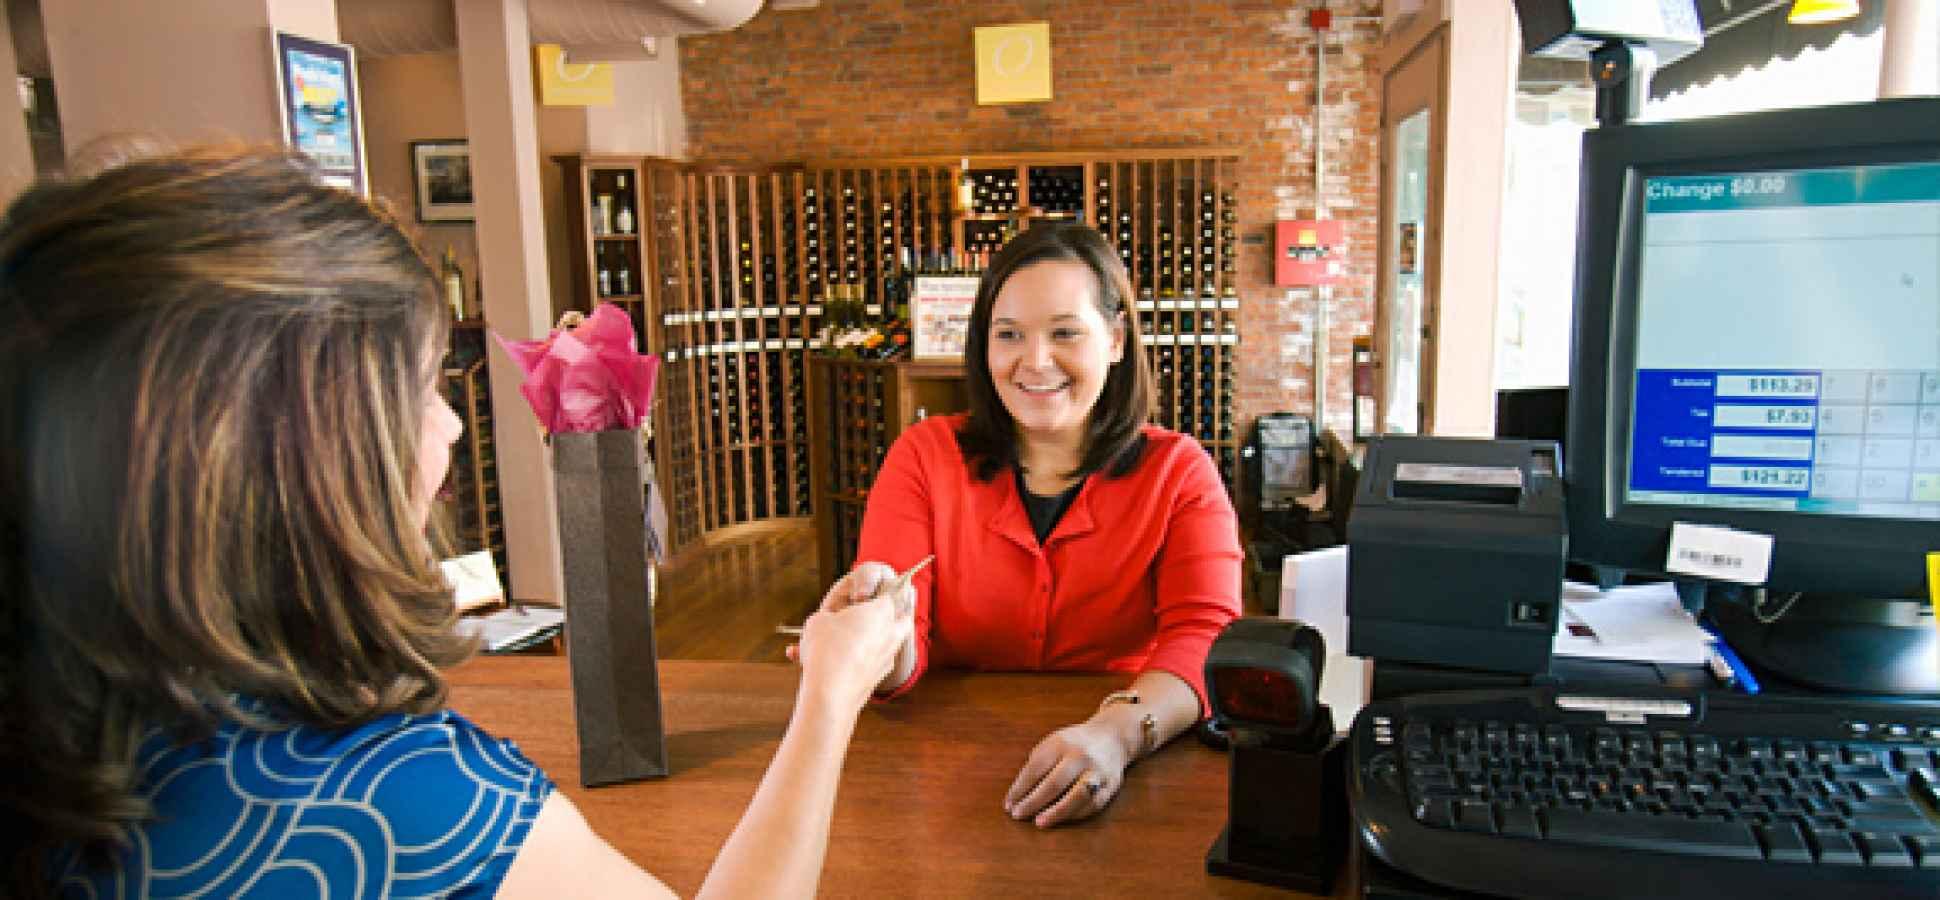 8 Ways to Build Customer Loyalty